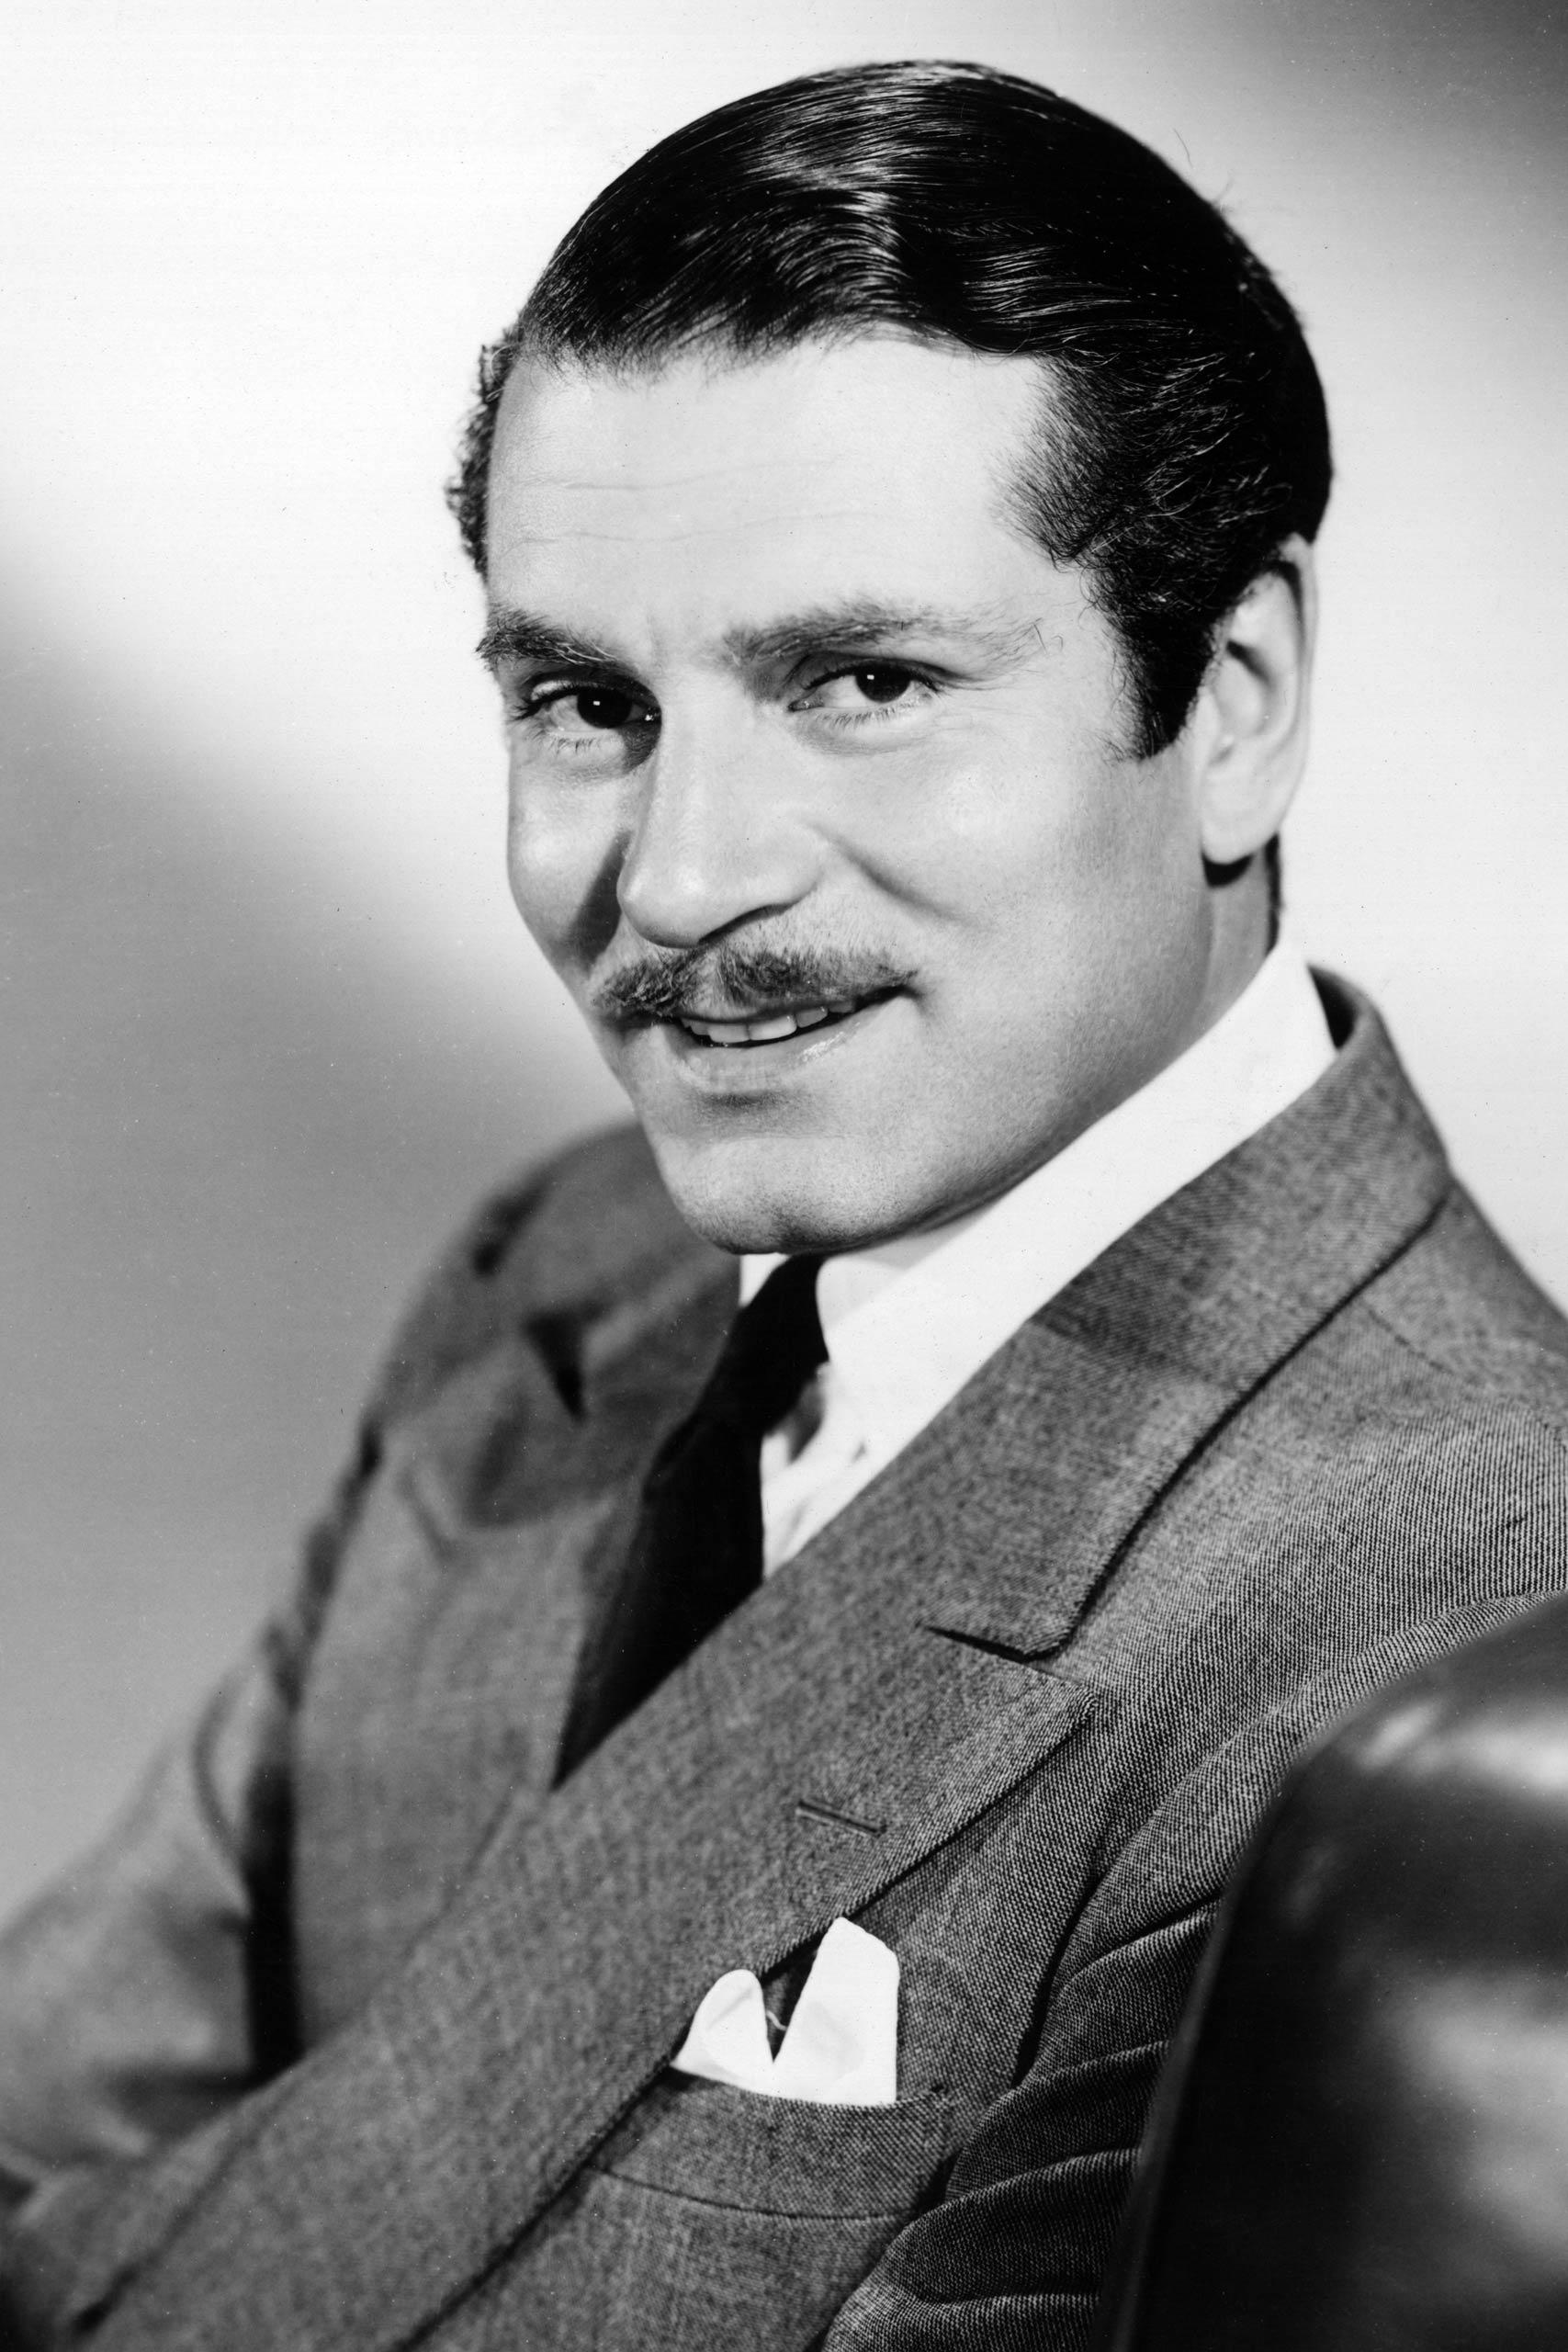 <strong>1949: Laurence Olivier - <i>Hamlet</i></strong>